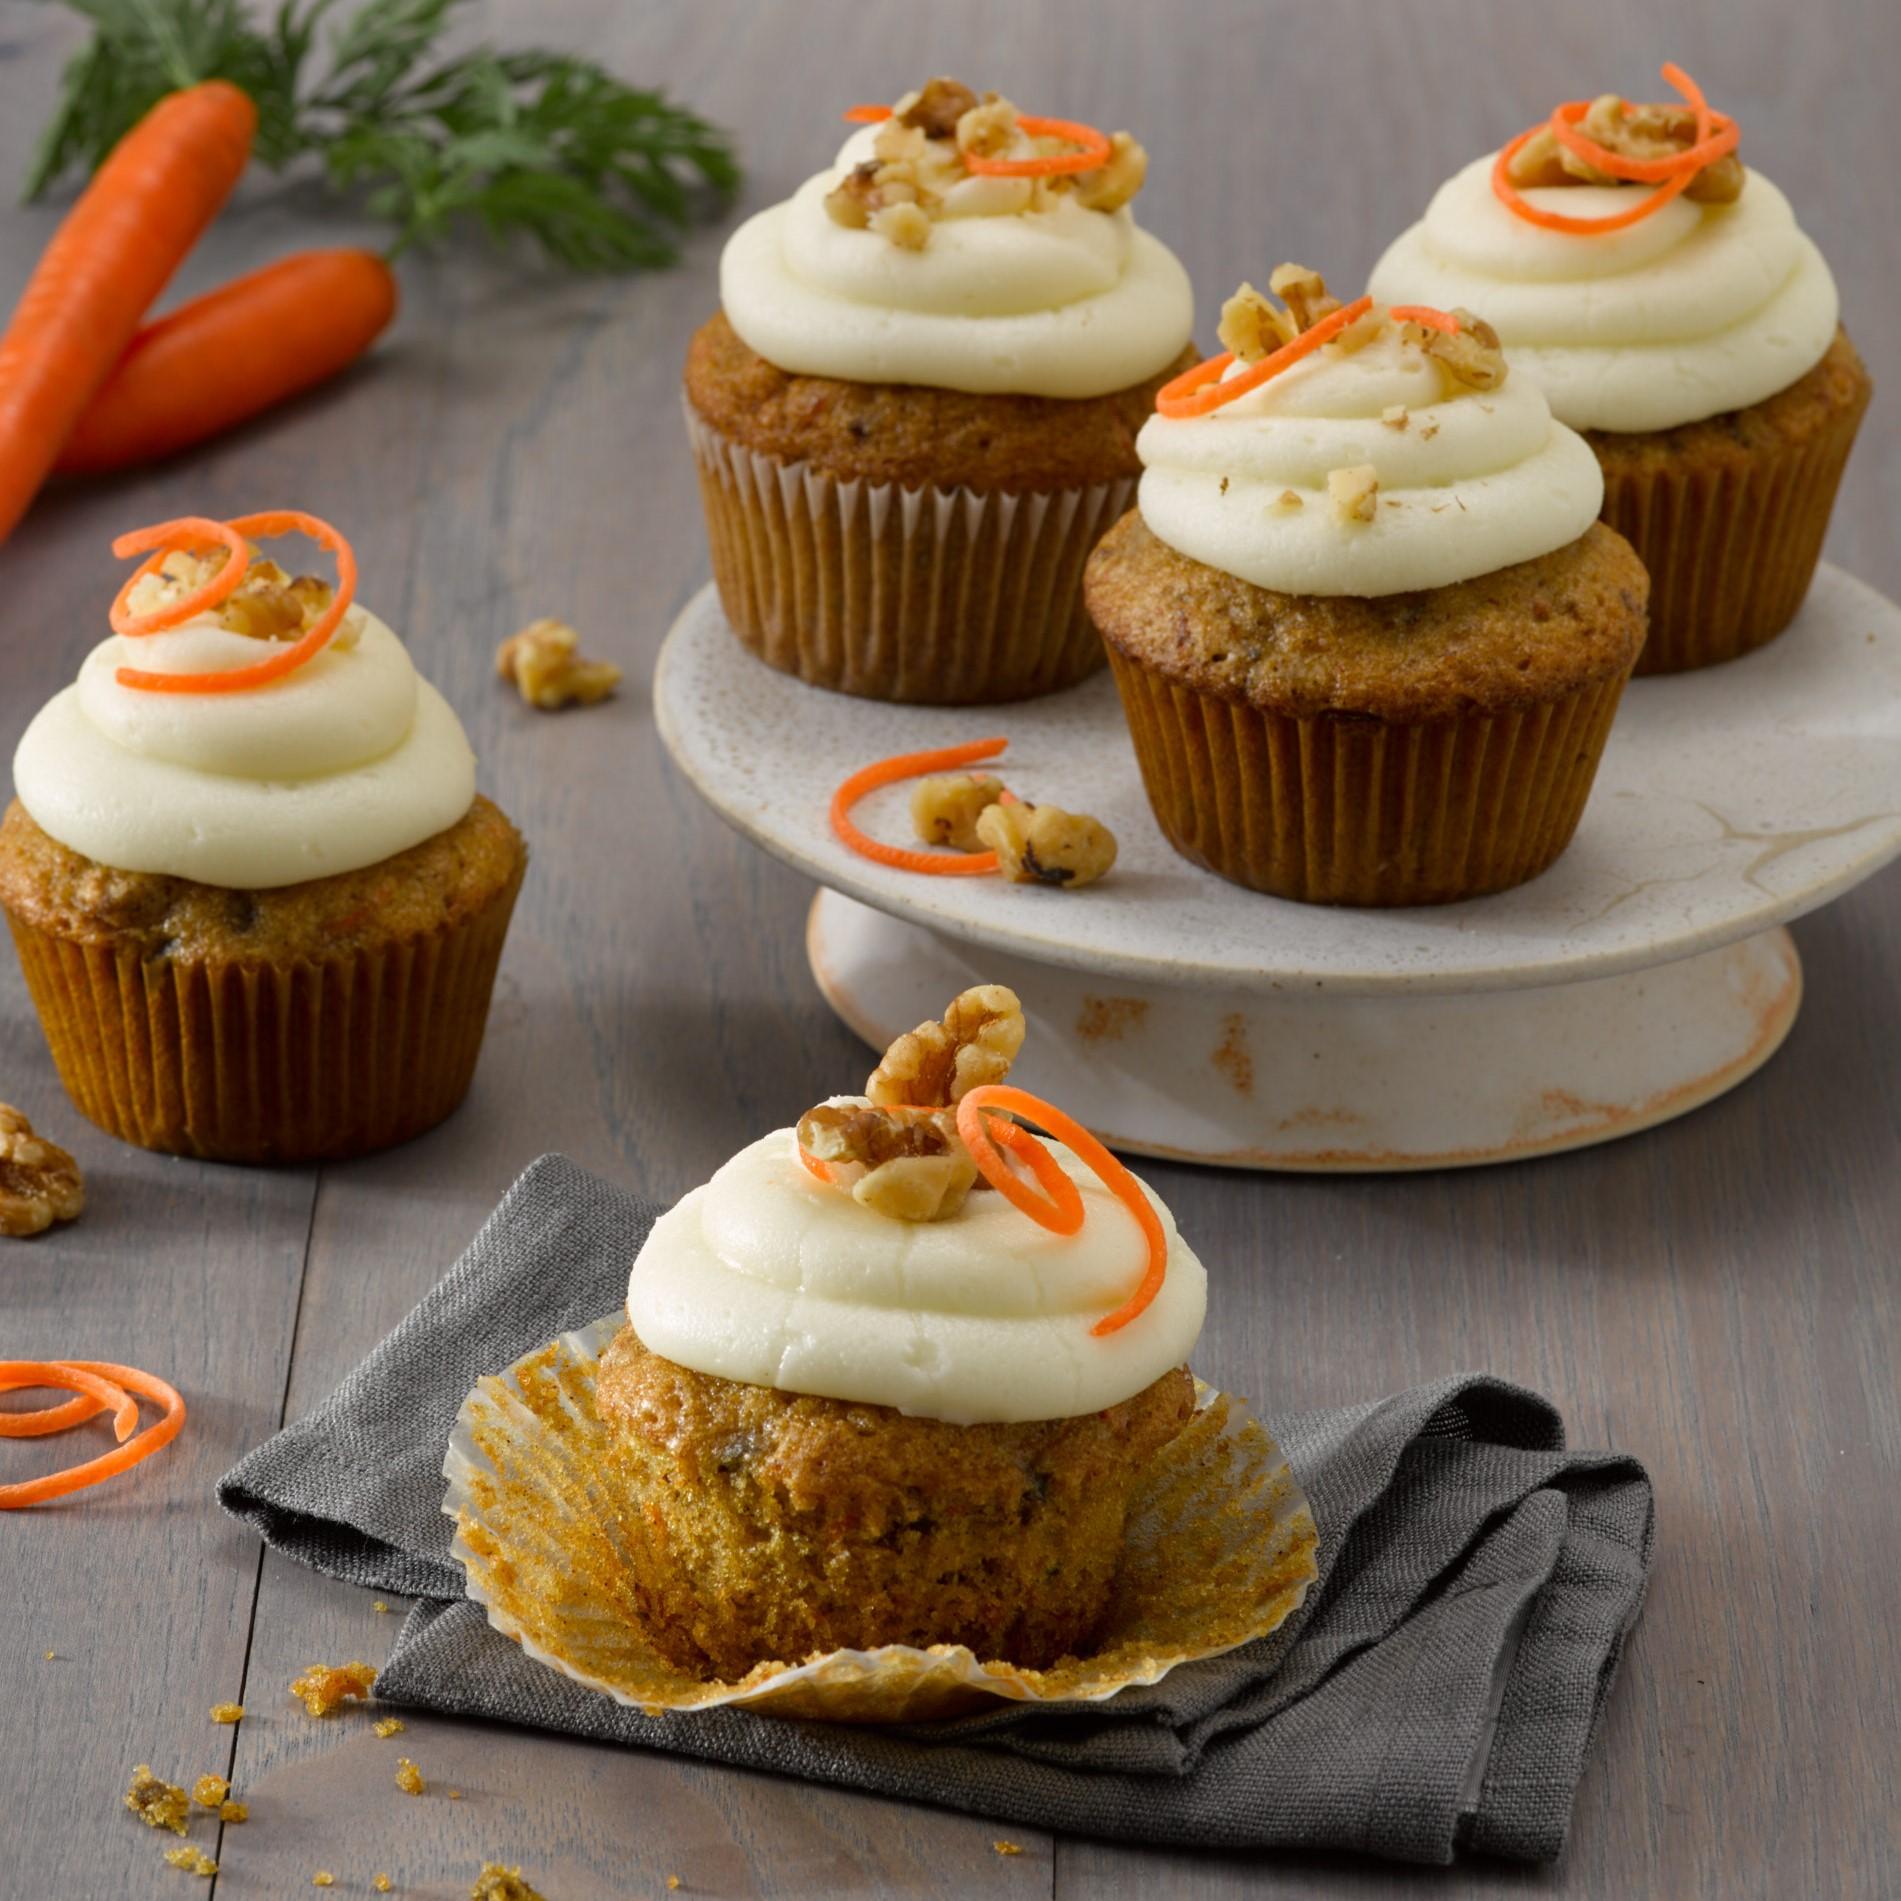 Gluten Free Walnut Carrot Cupcakes